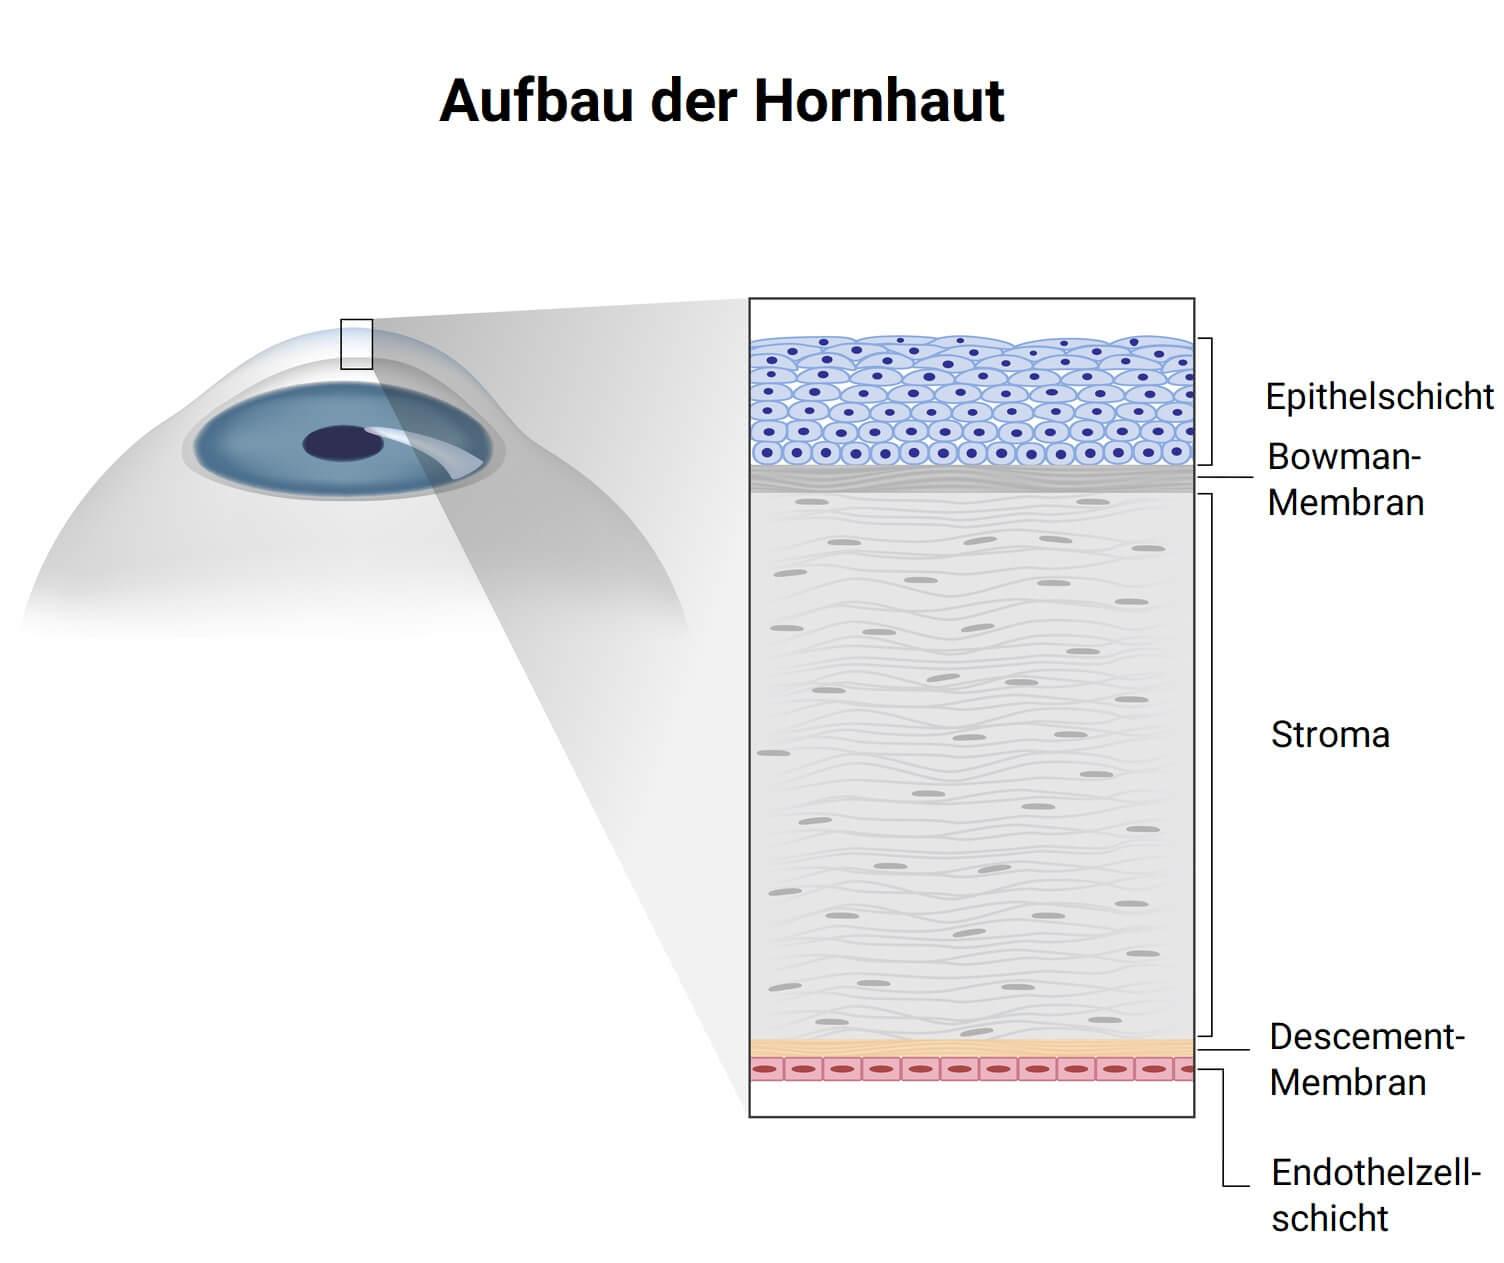 Aufbau der Hornhaut